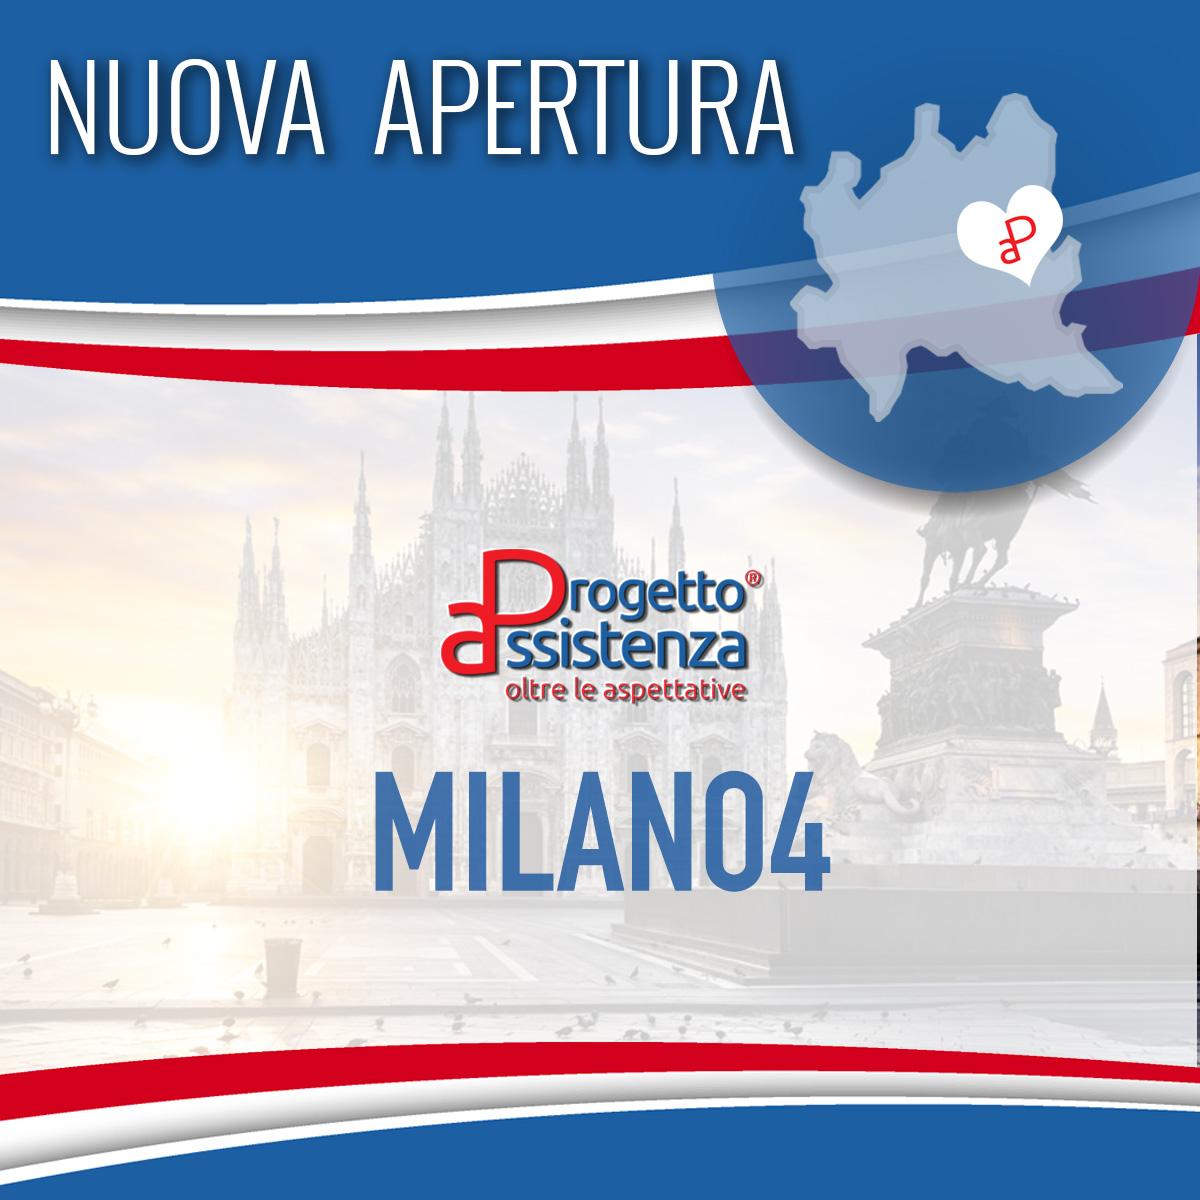 Nuova Apertura: Milano4